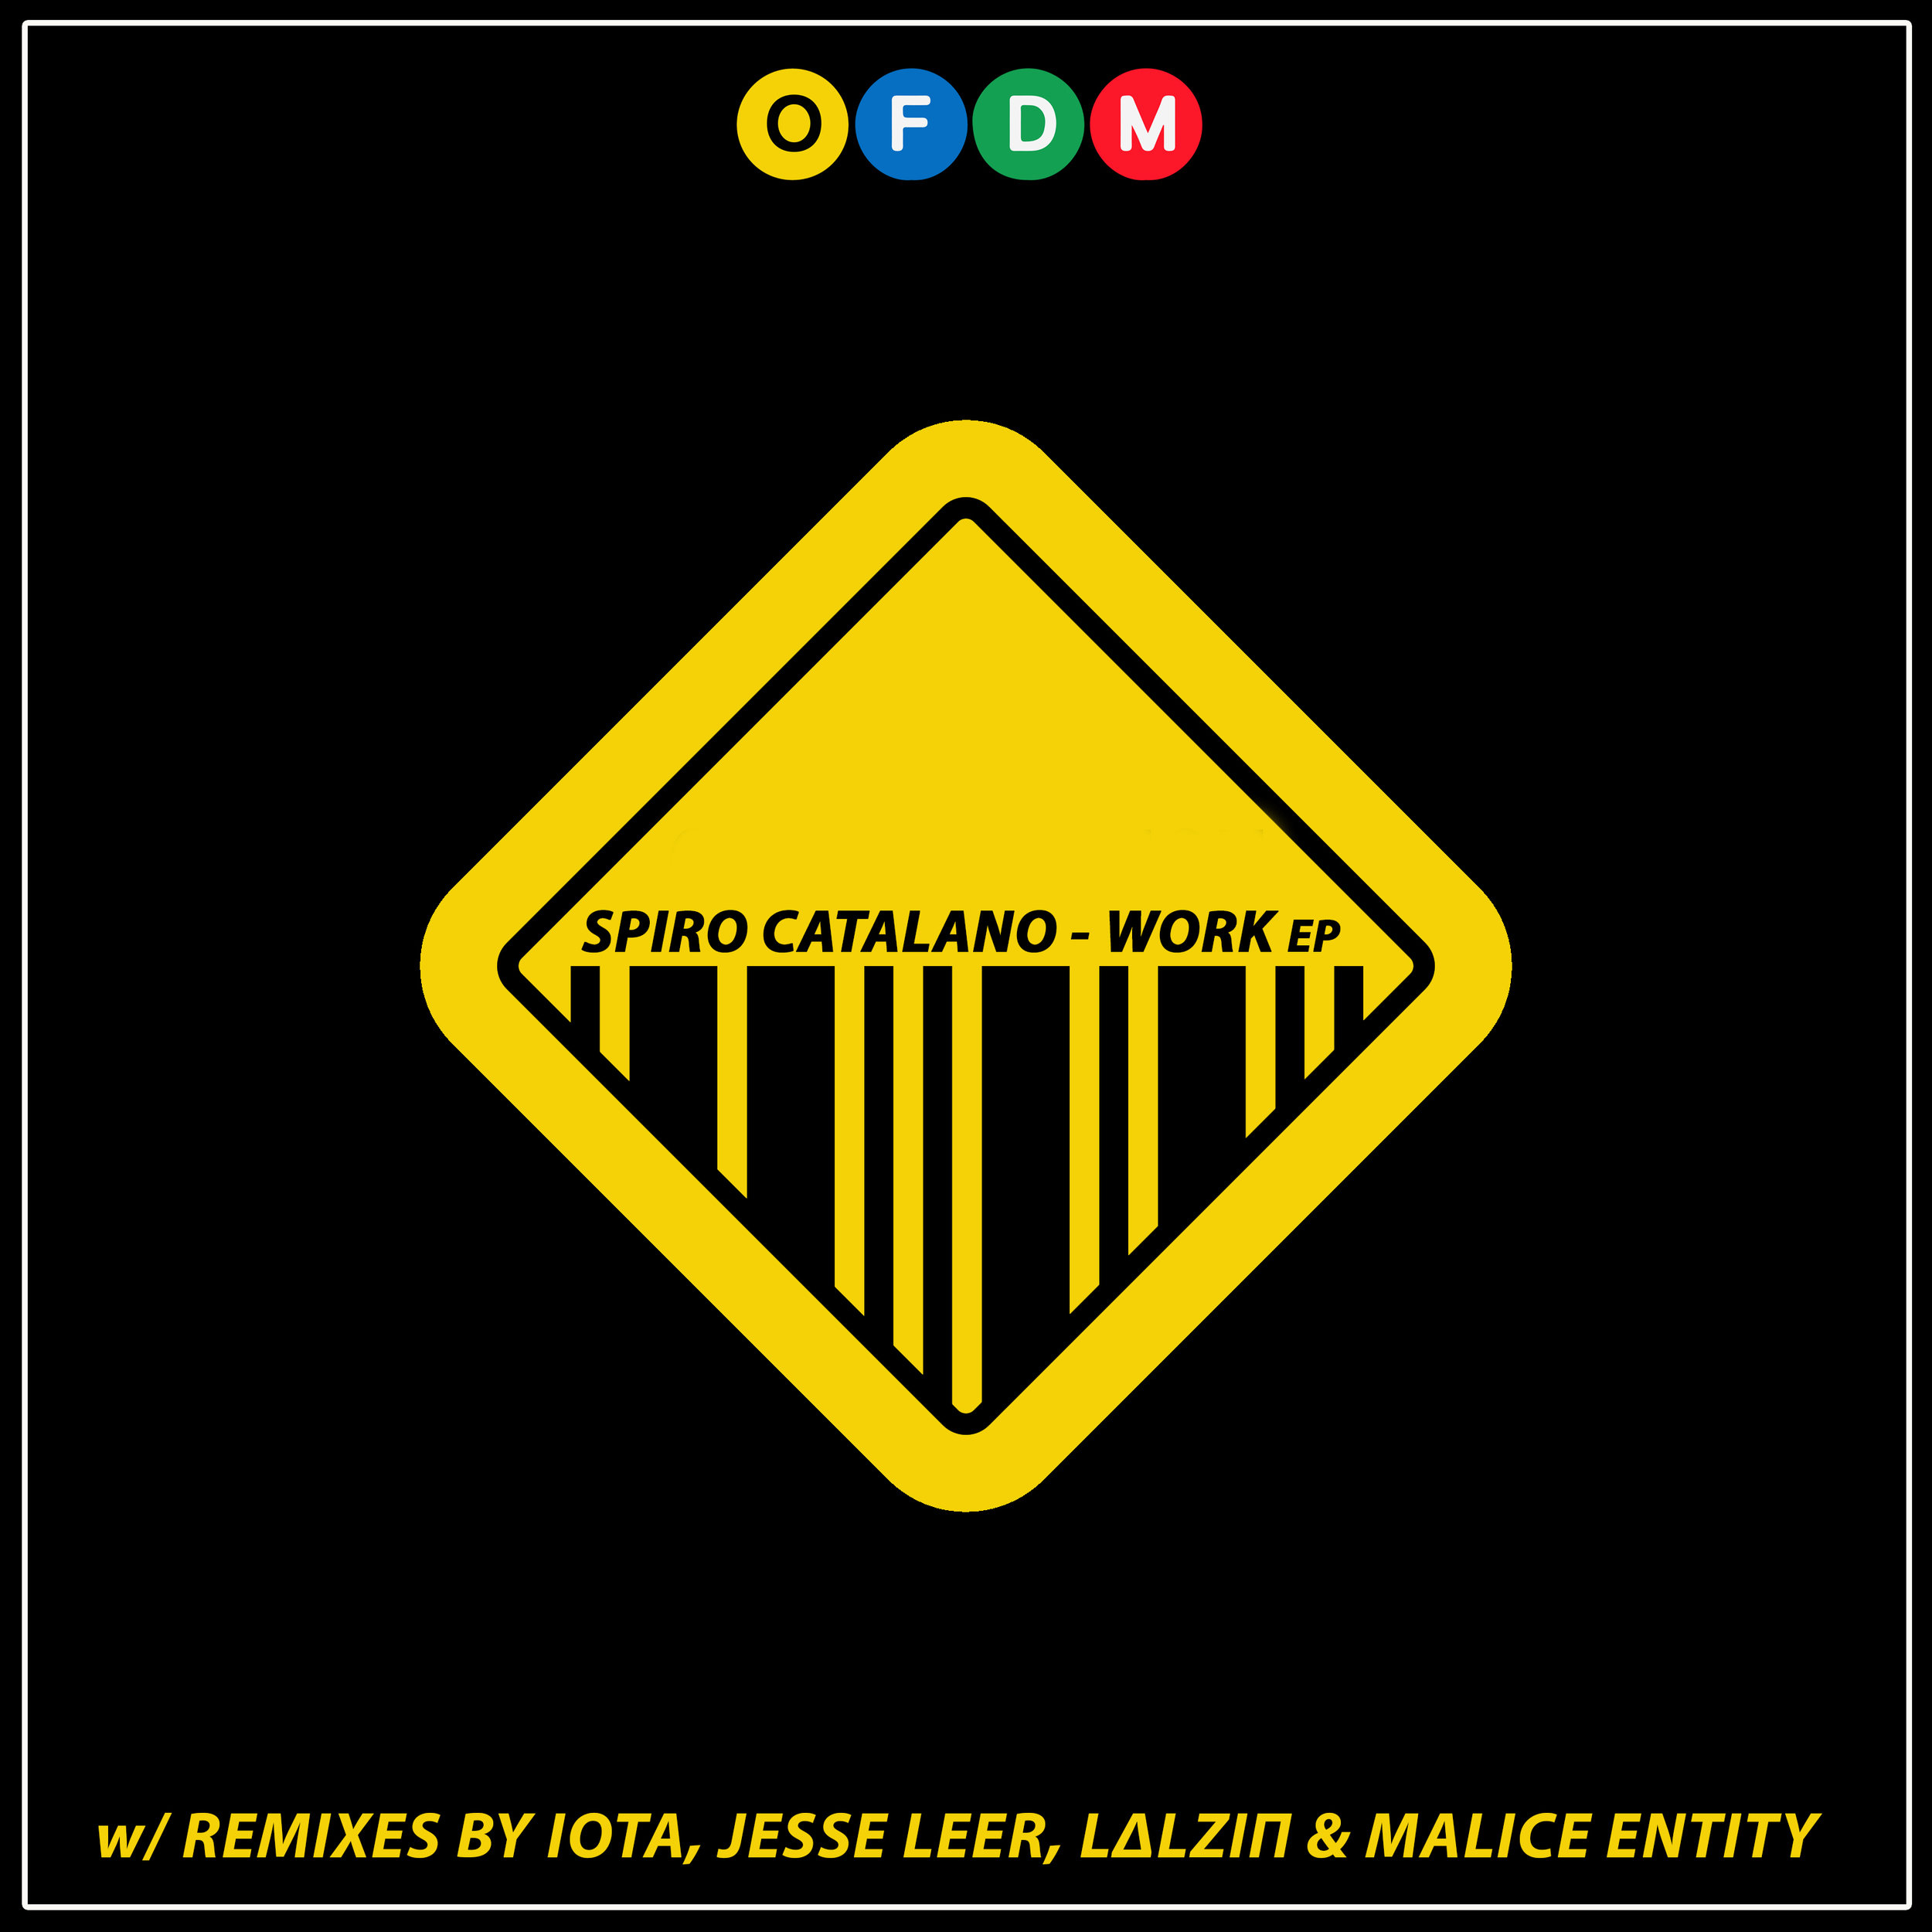 [OFDM034] Spiro Catalano - Work EP (ARTWORK).jpg